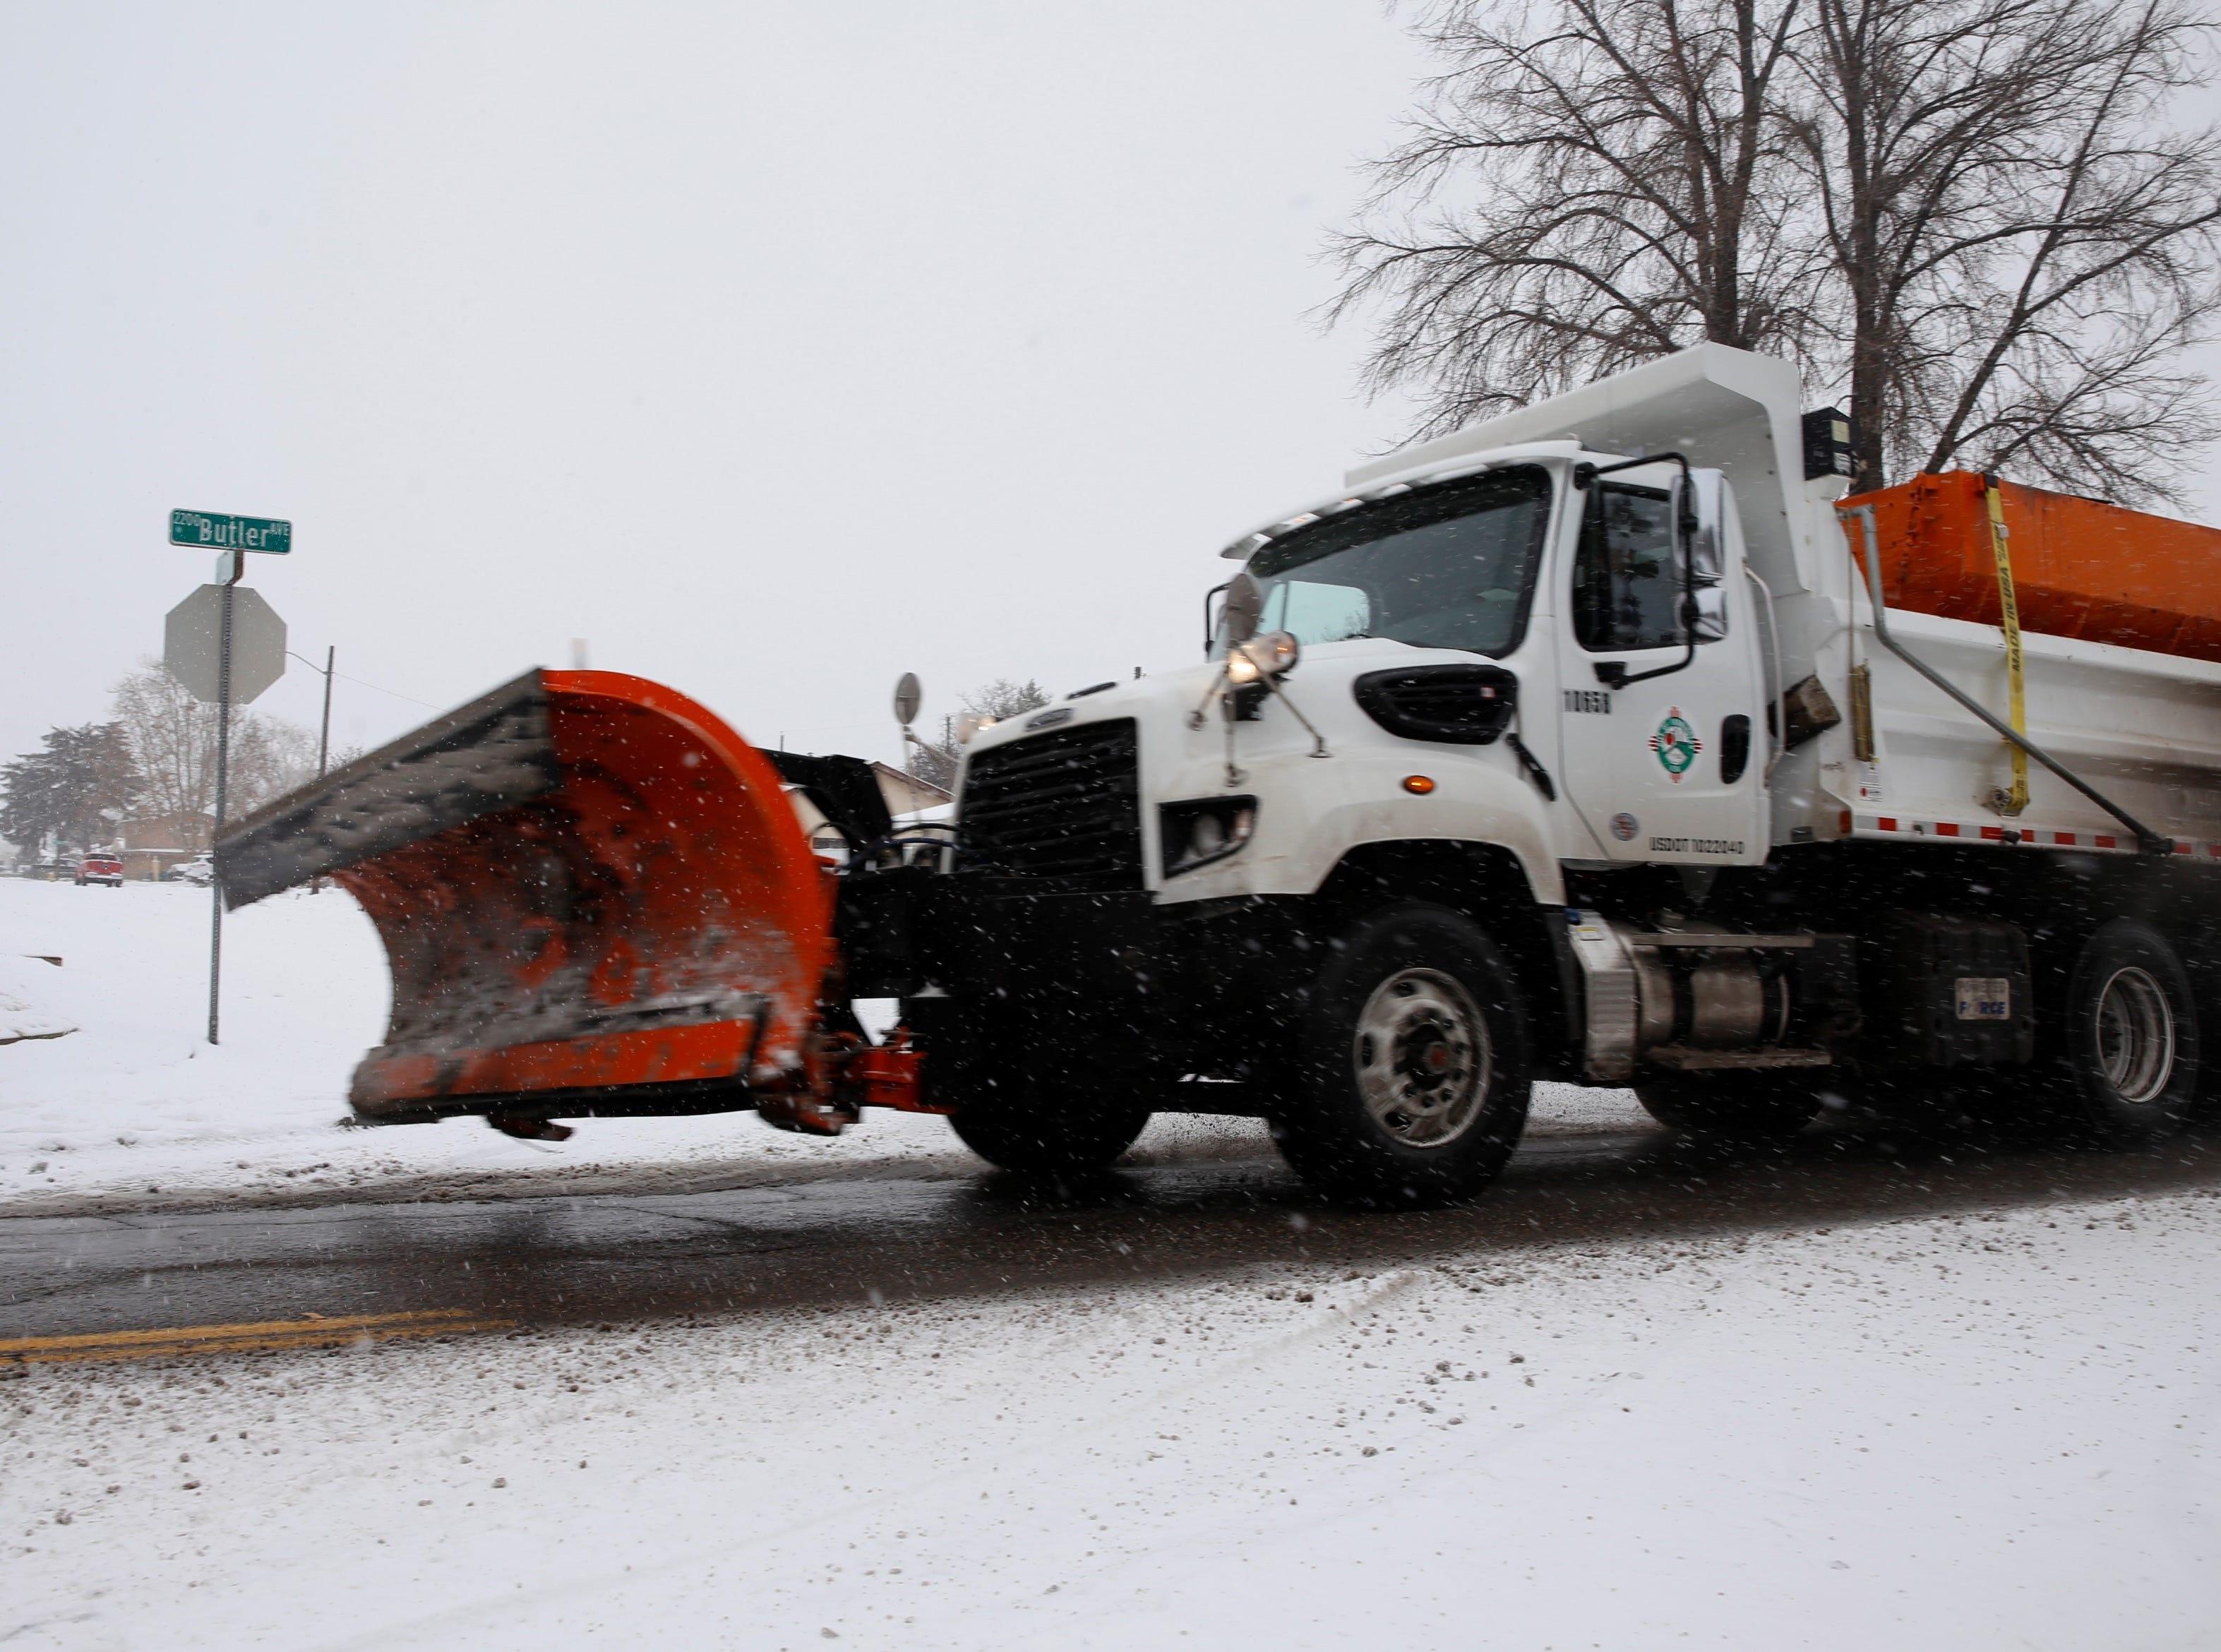 A city of Farmington snow plow travels near the 2200 block of Butler Avenue on Monday in Farmington.